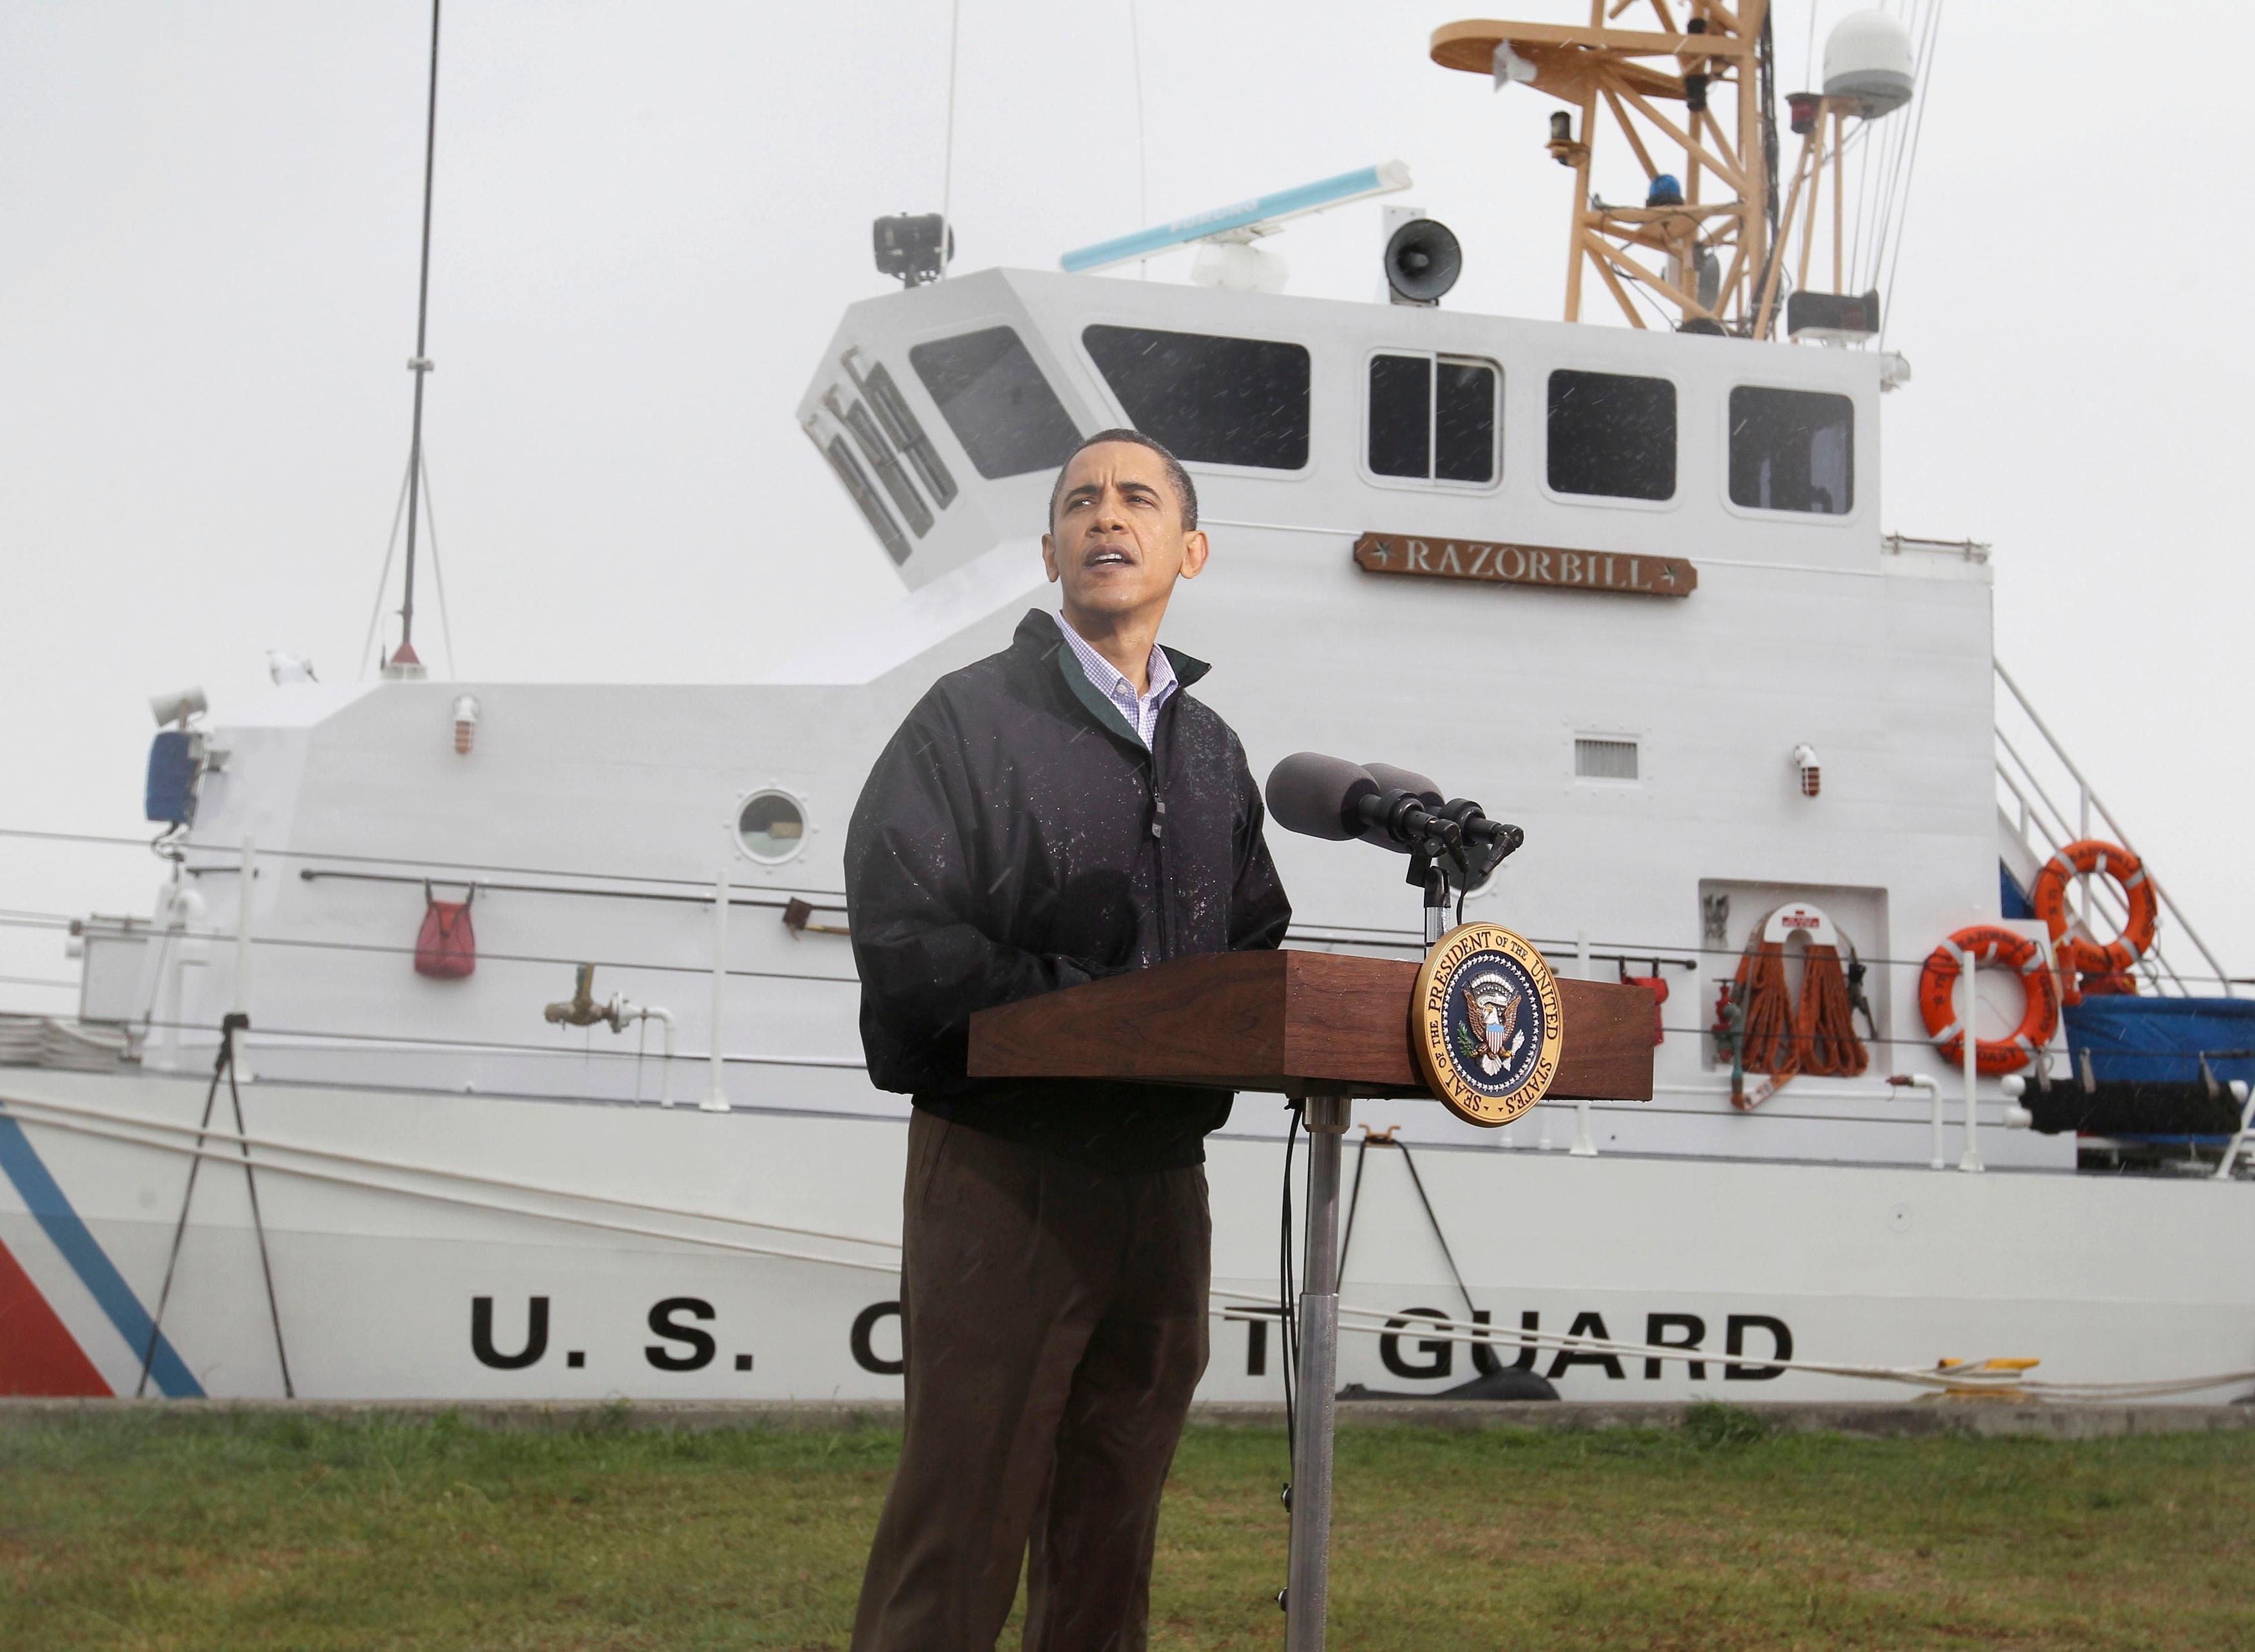 Obama recule face au lobby pétrolier